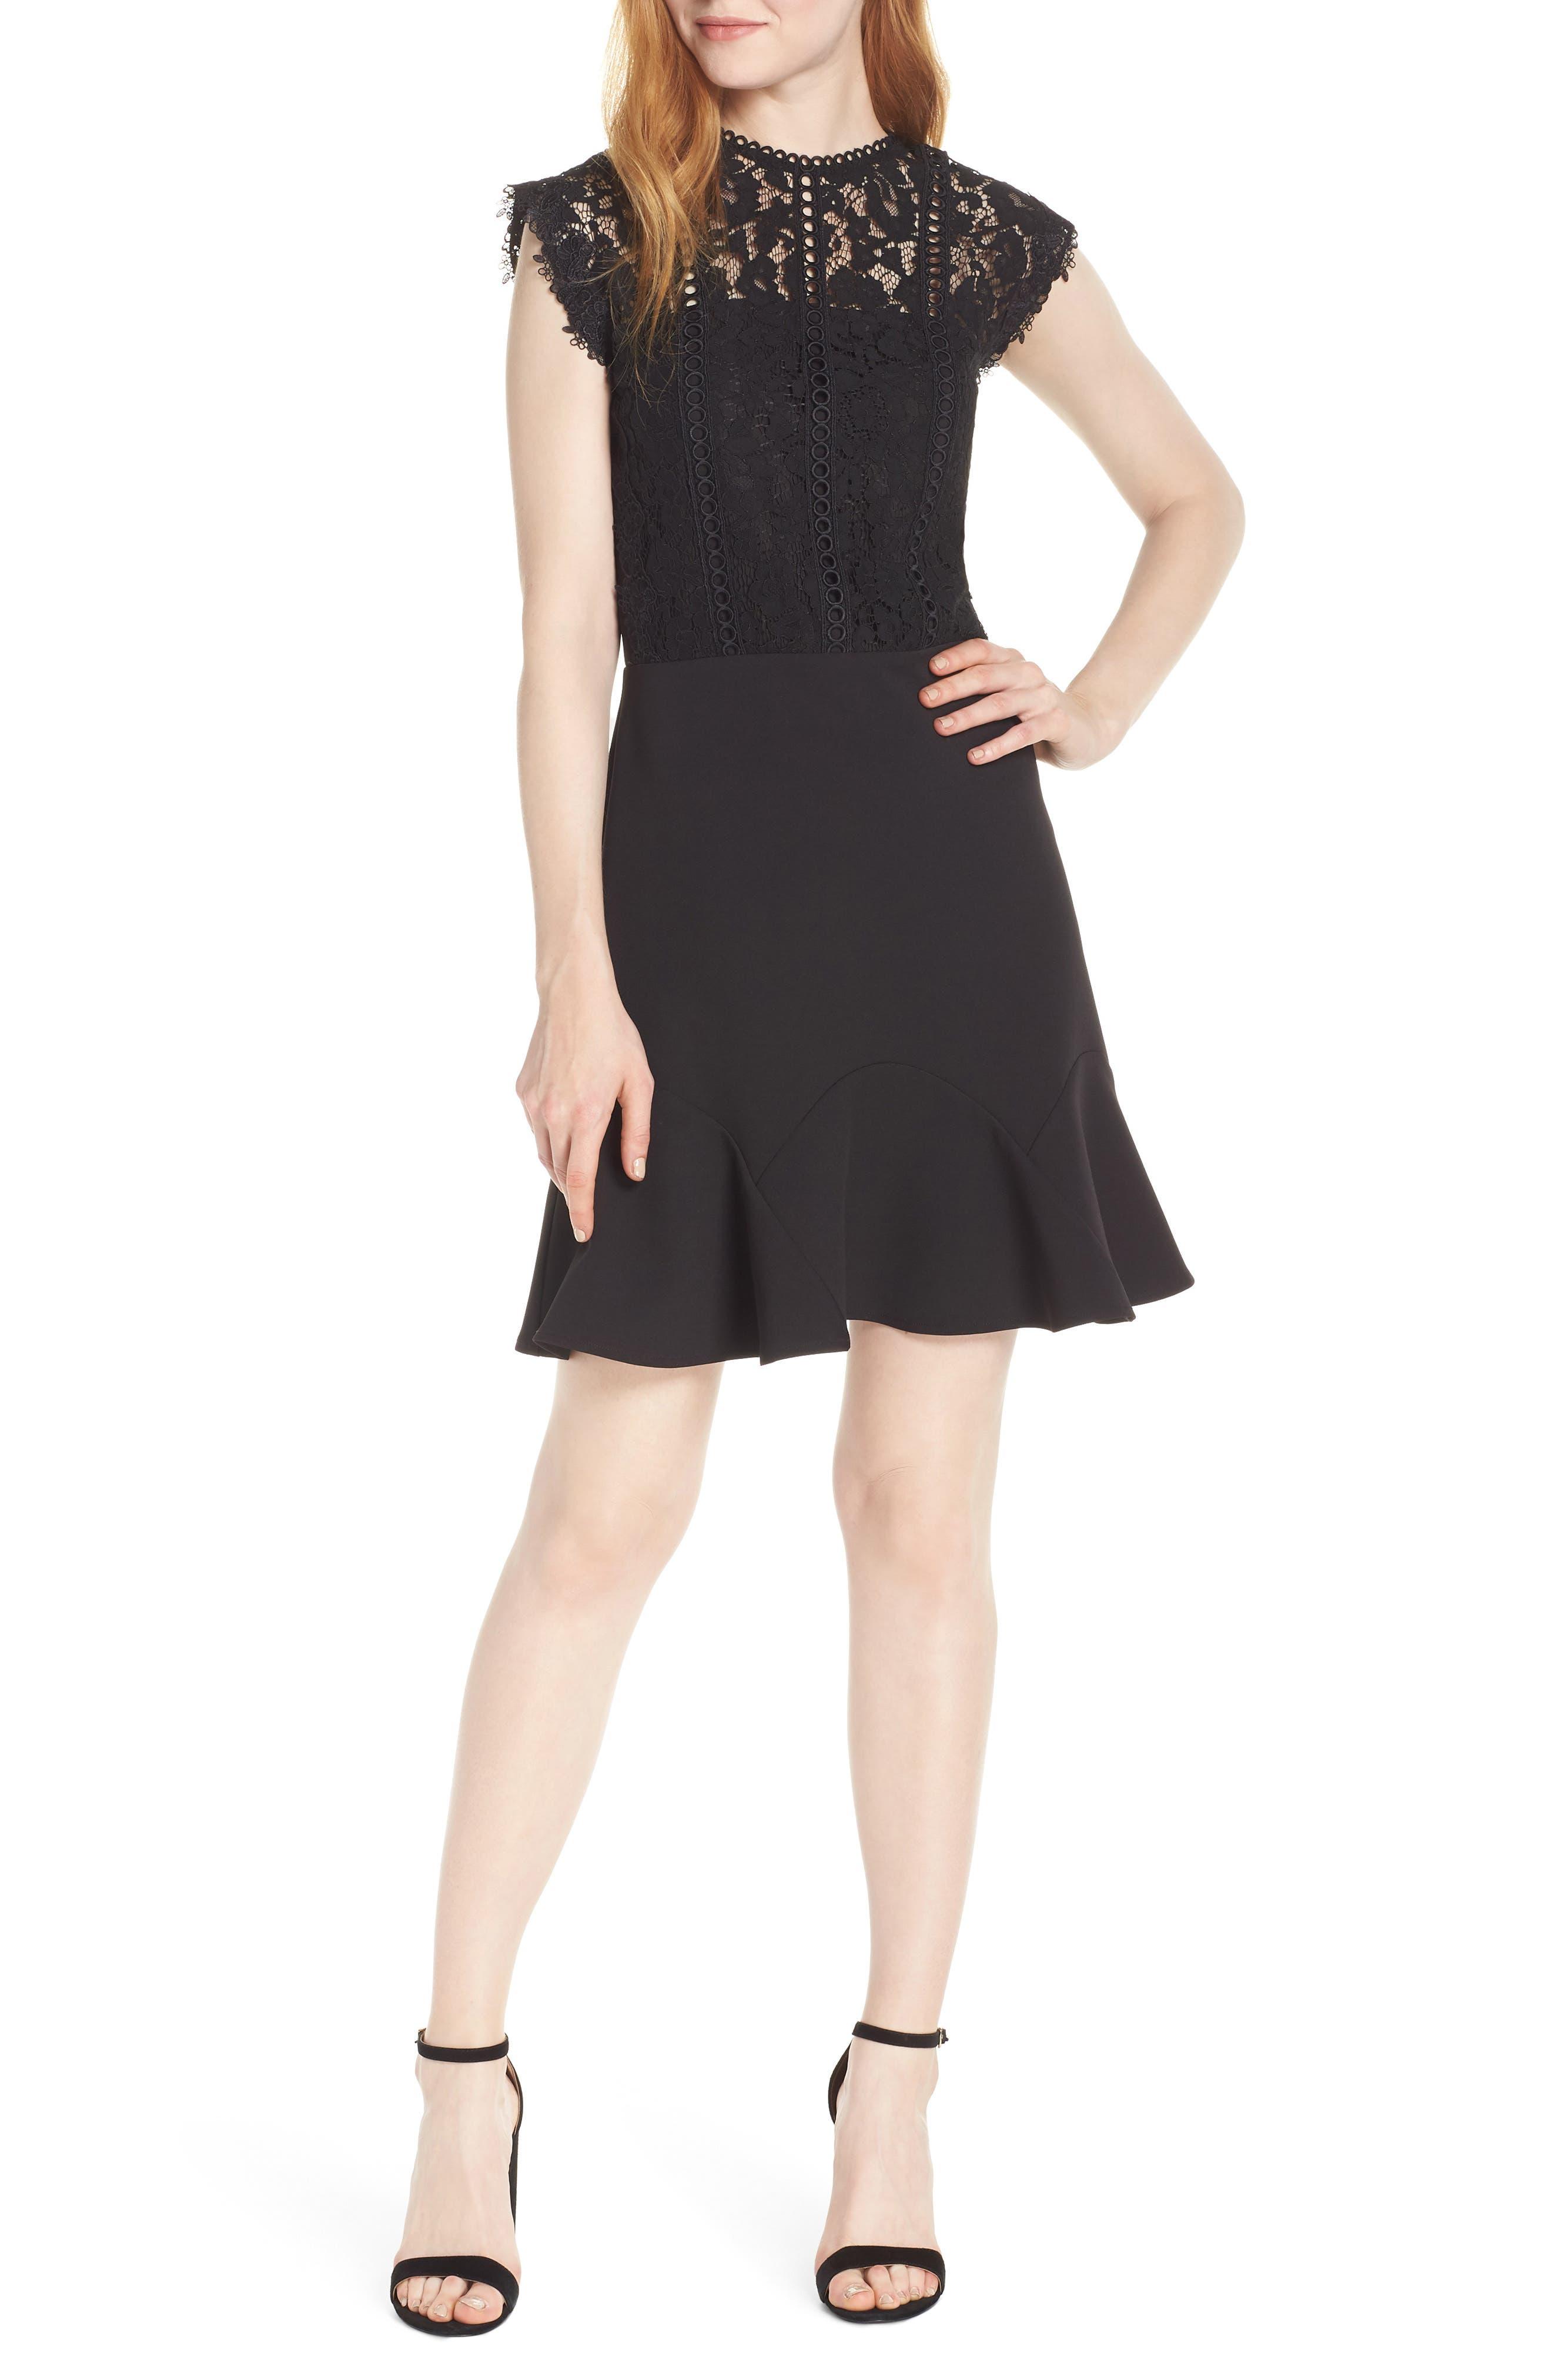 Hadley Fit & Flare Dress in Black